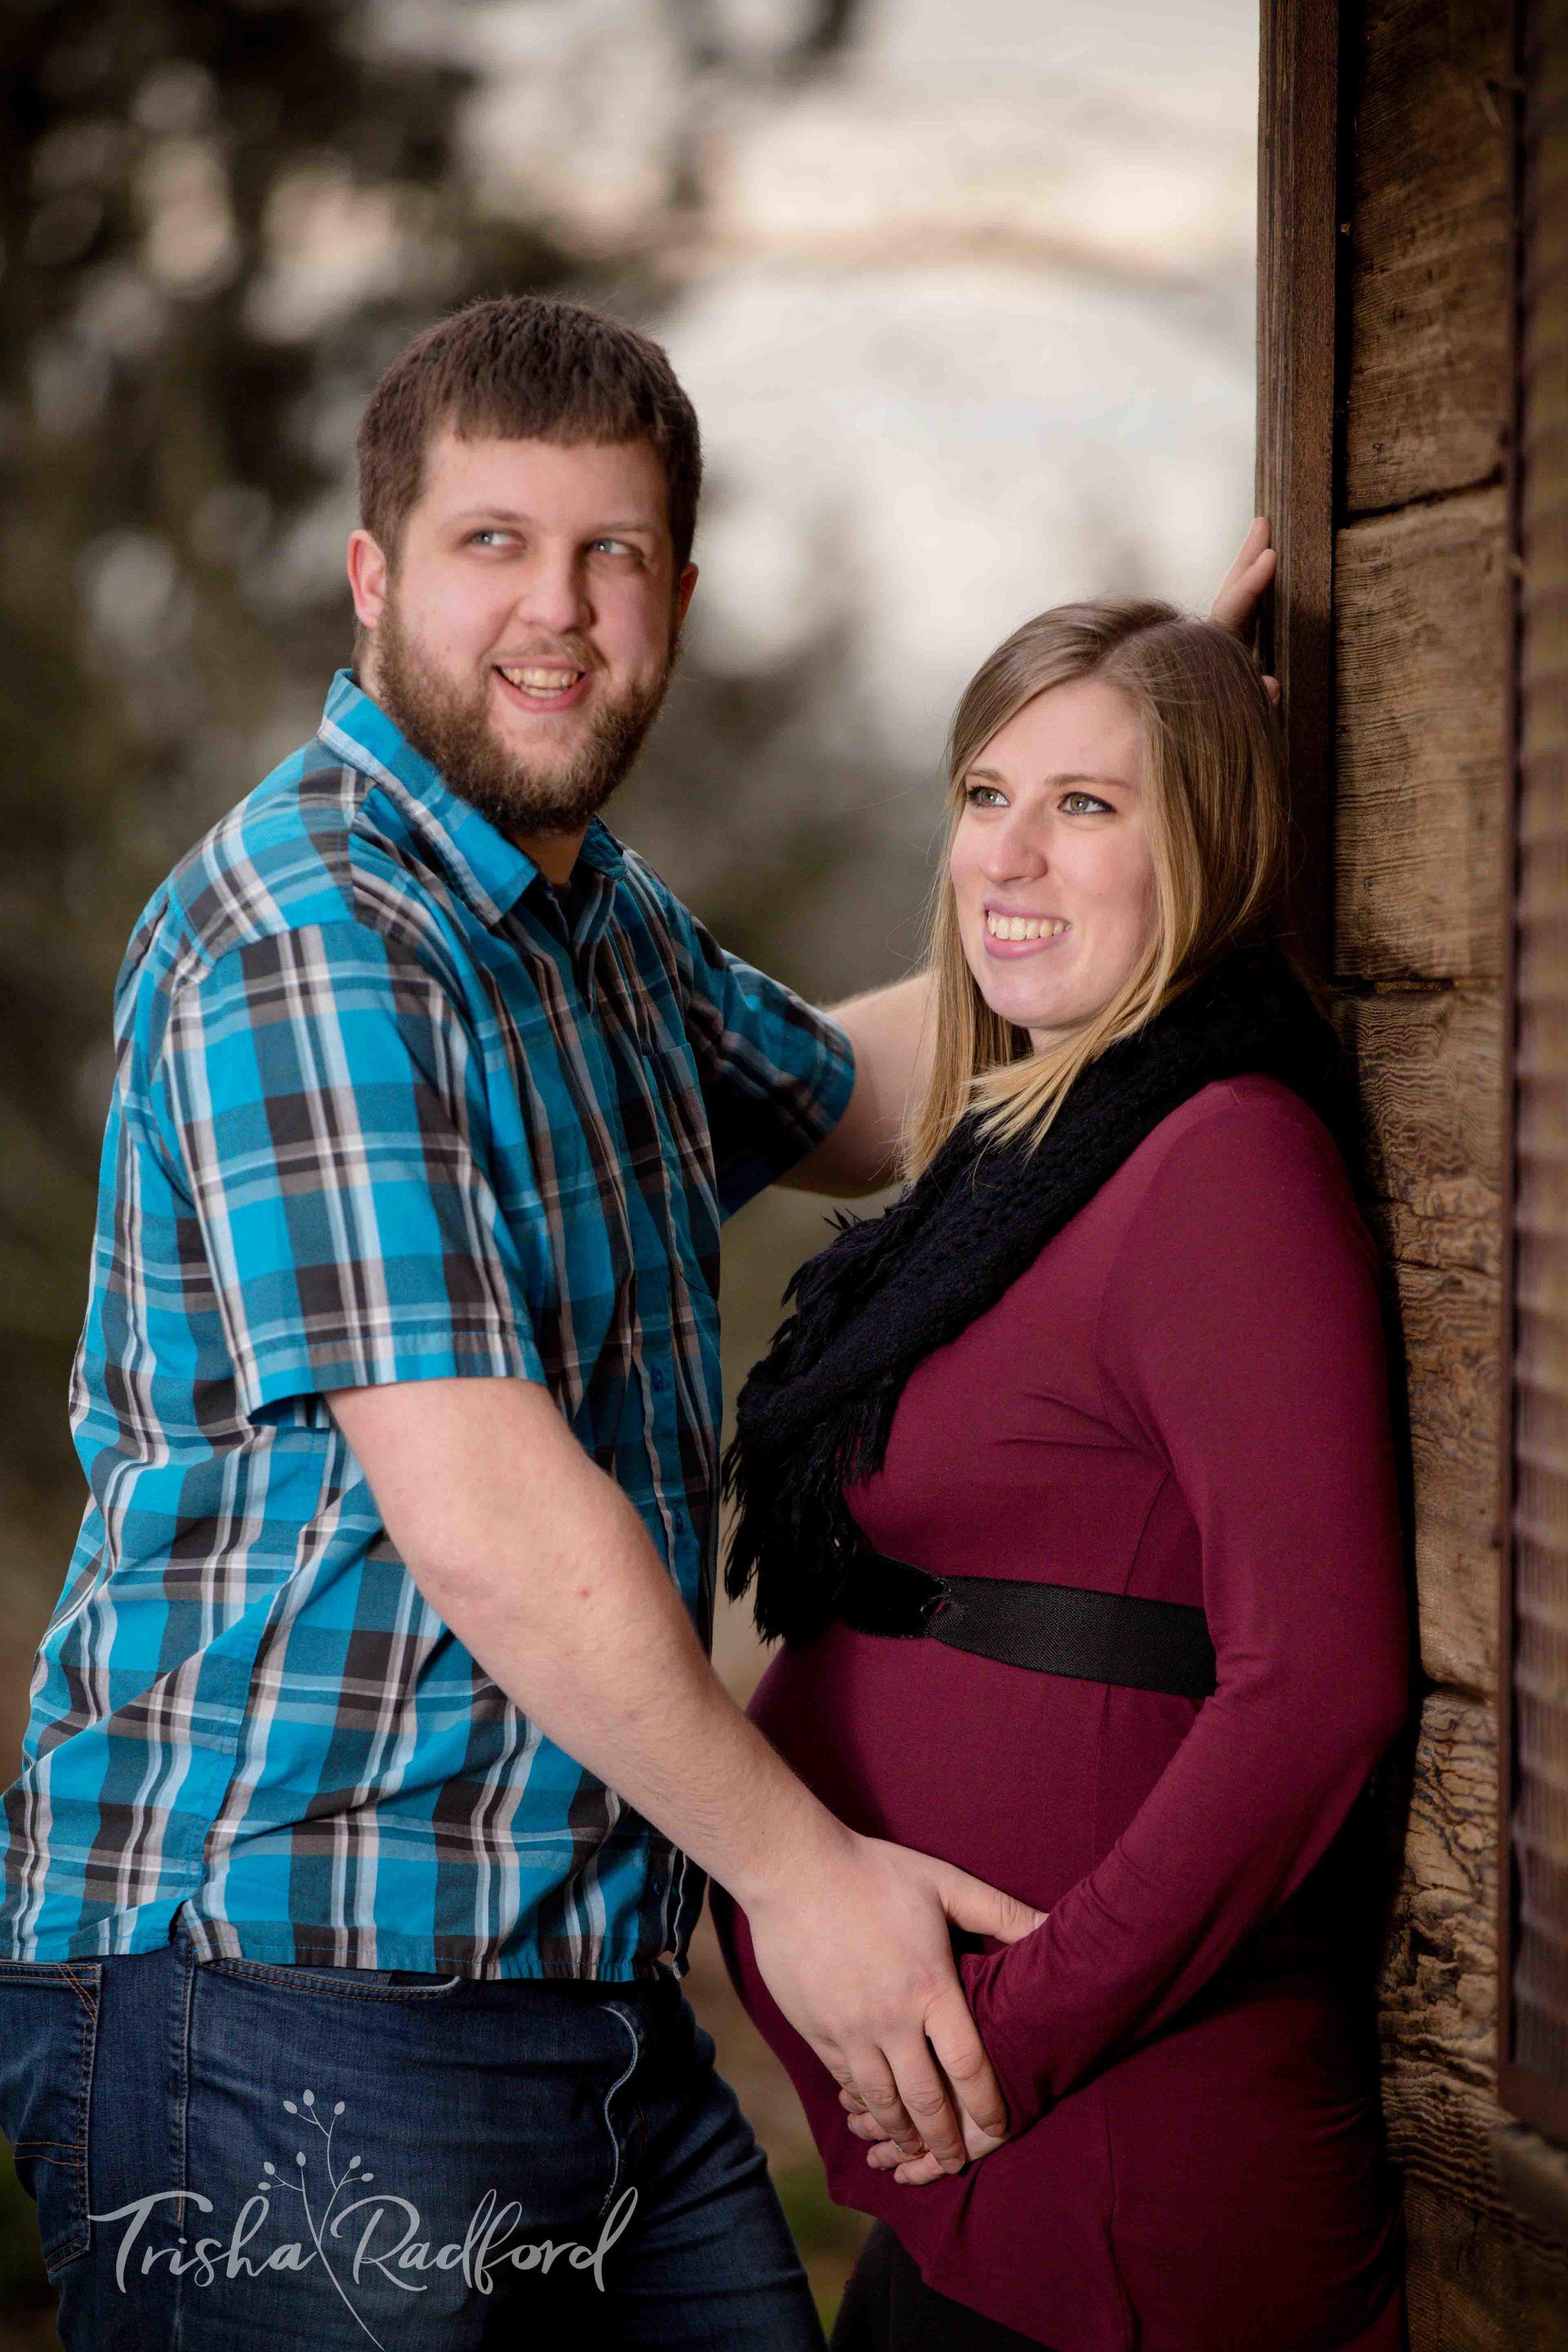 Snohomish County Photographer | Maternity Photography | Jennings Park, Marysville